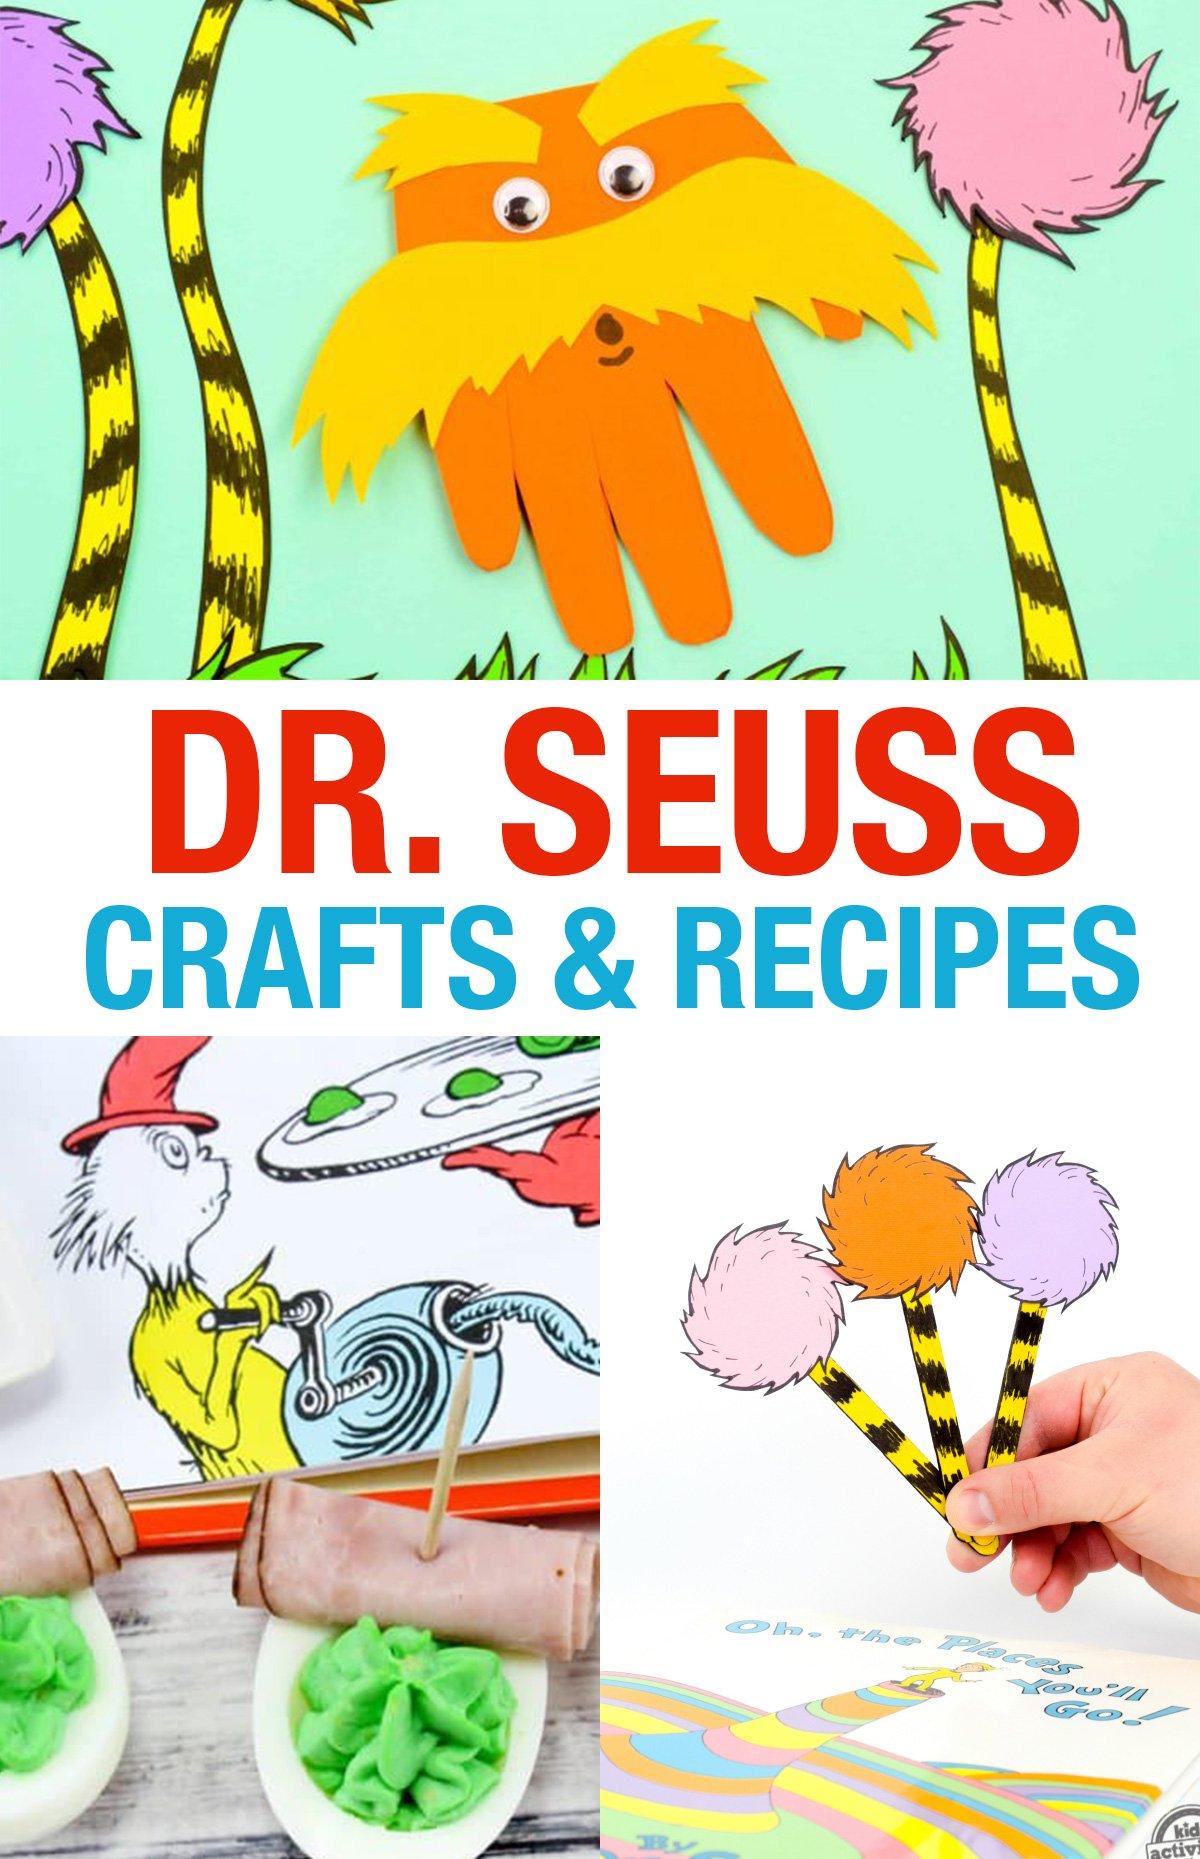 Dr. Seuss Crafts and Recipes